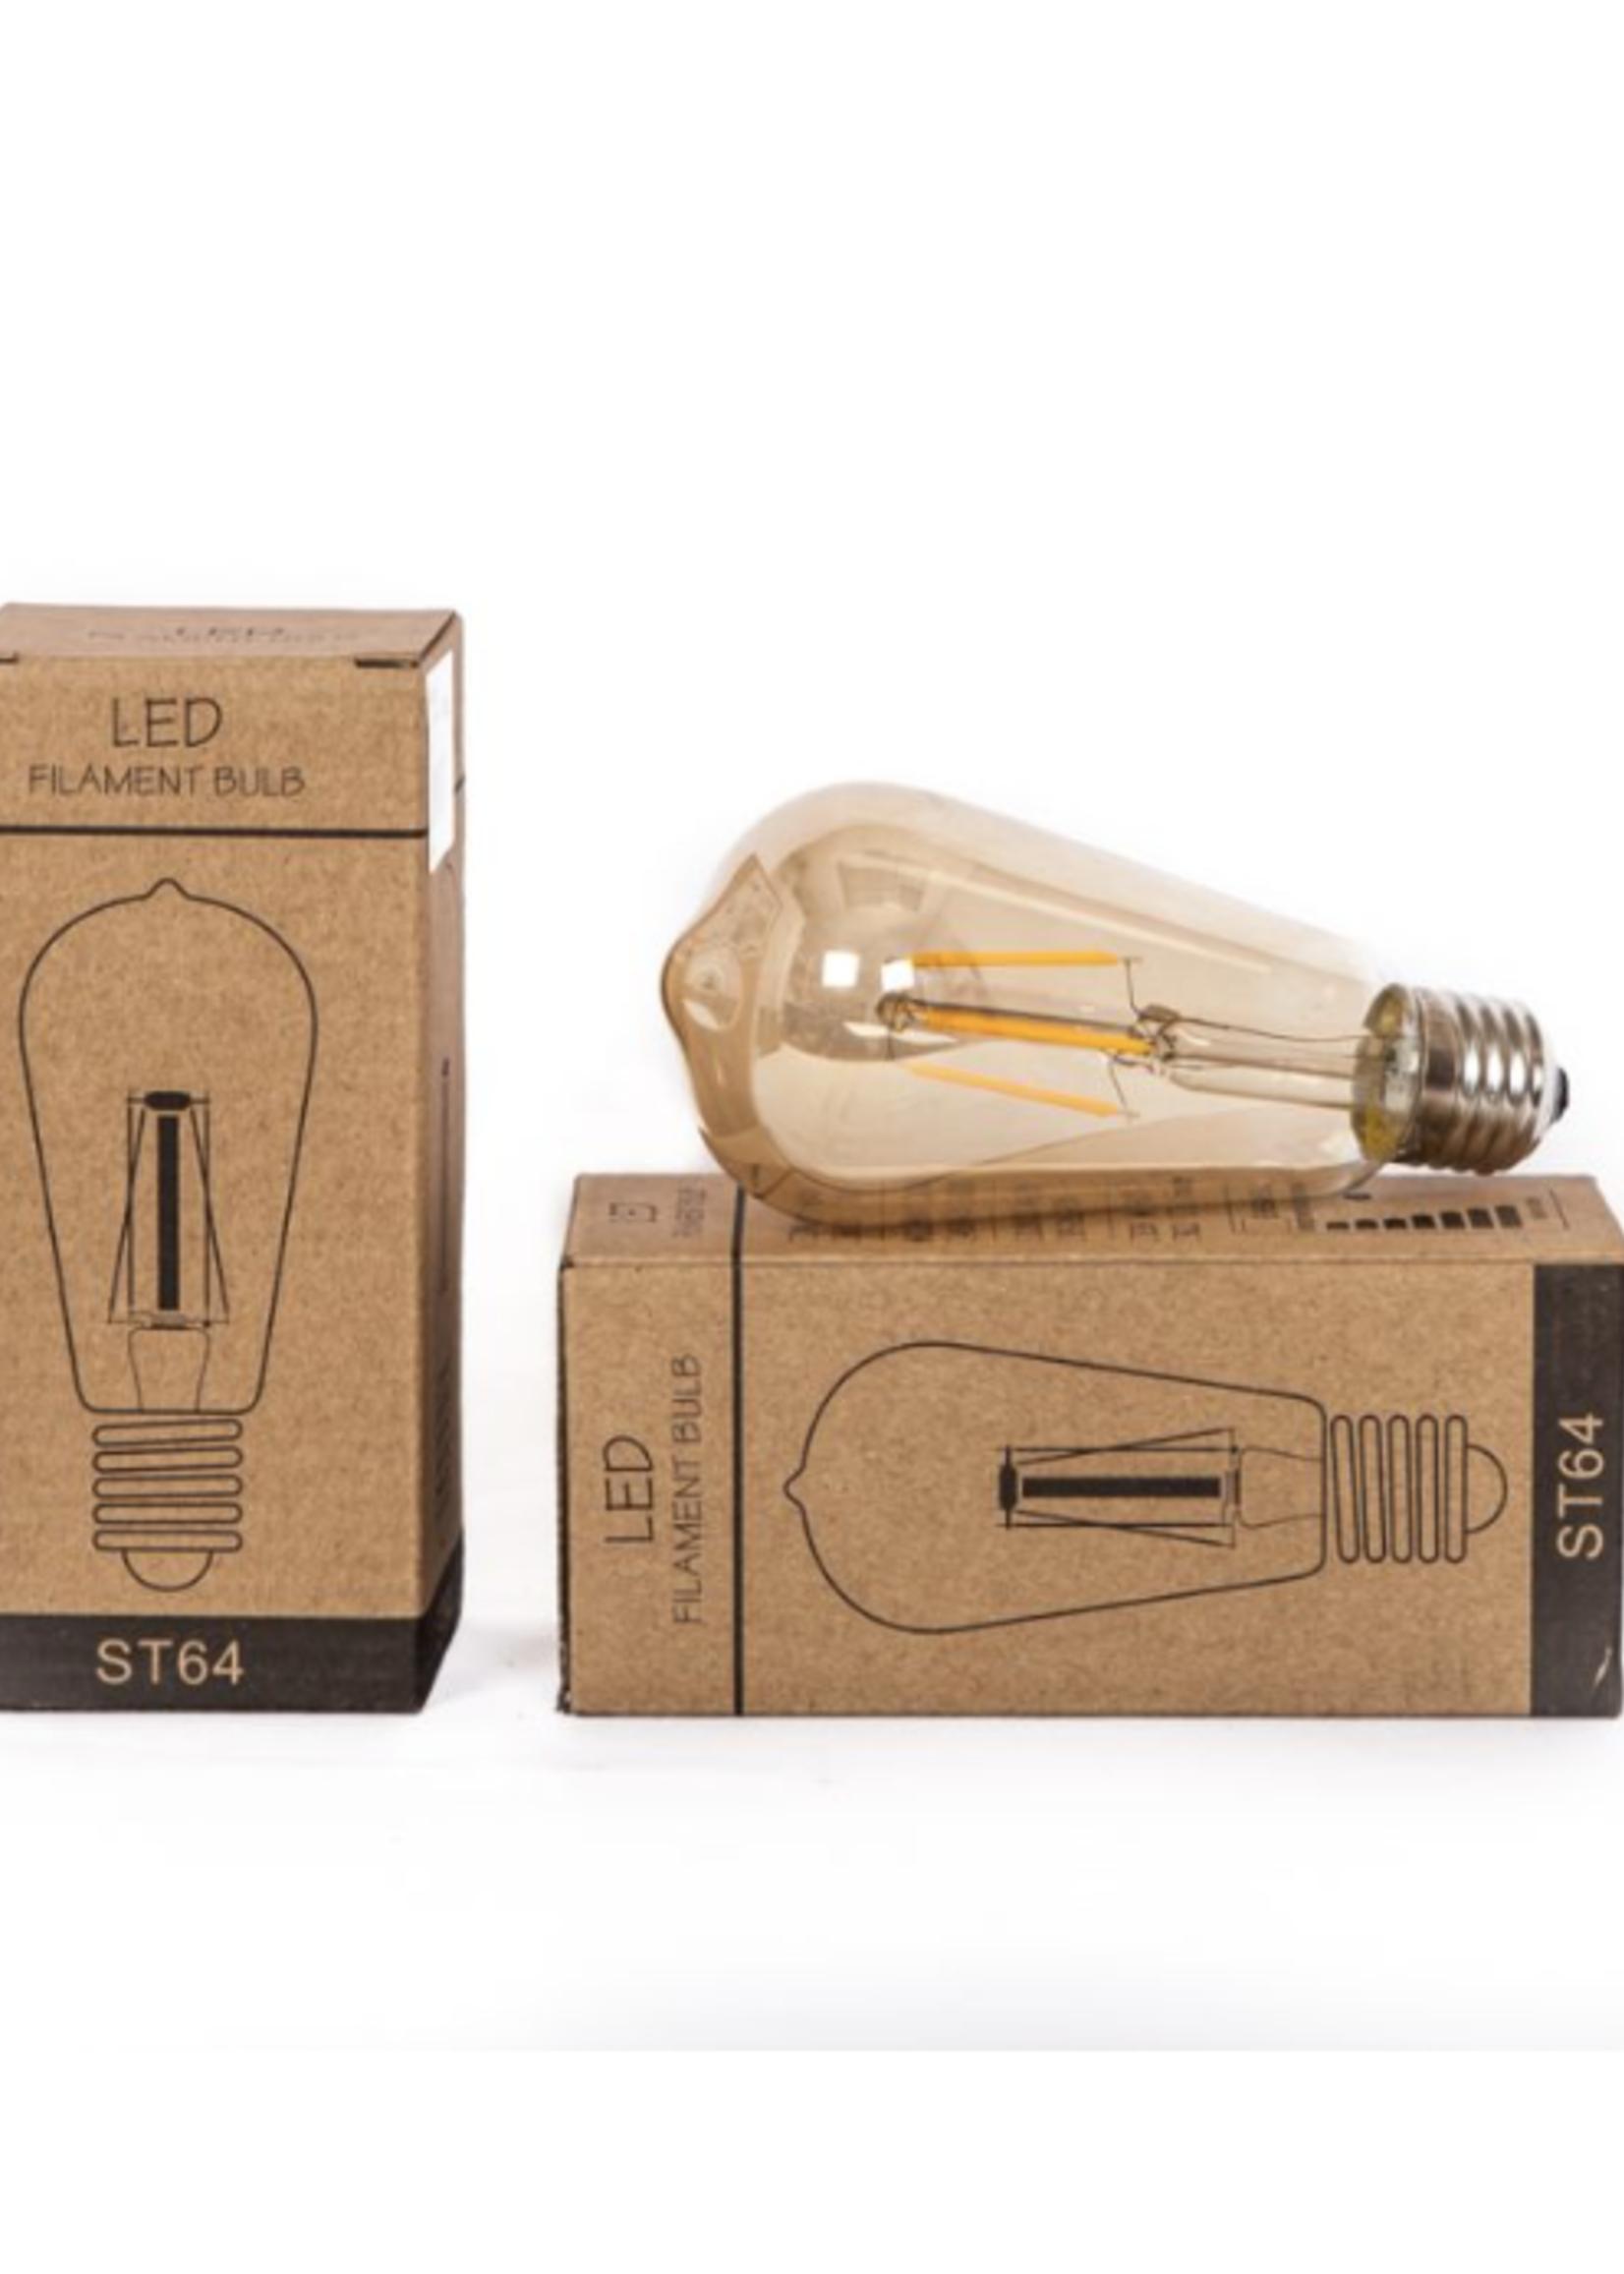 LED-lamp 2W peer model 6,5x6,5x15cm 160LUM 2300K